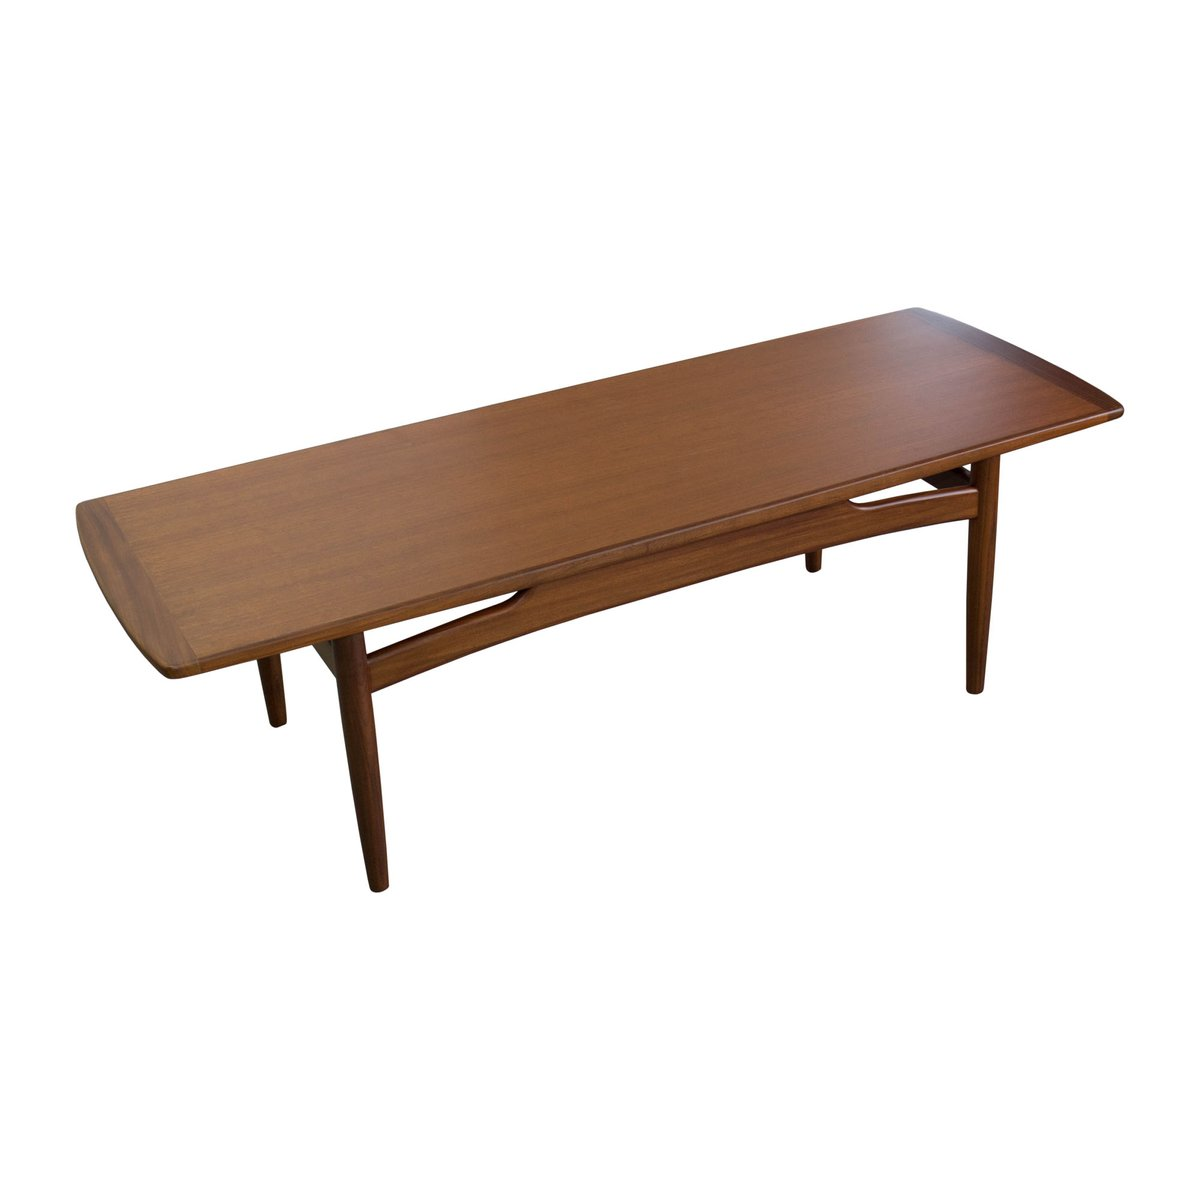 Teak Root Coffee Table Canada: Danish Teak Coffee Table, 1960s For Sale At Pamono